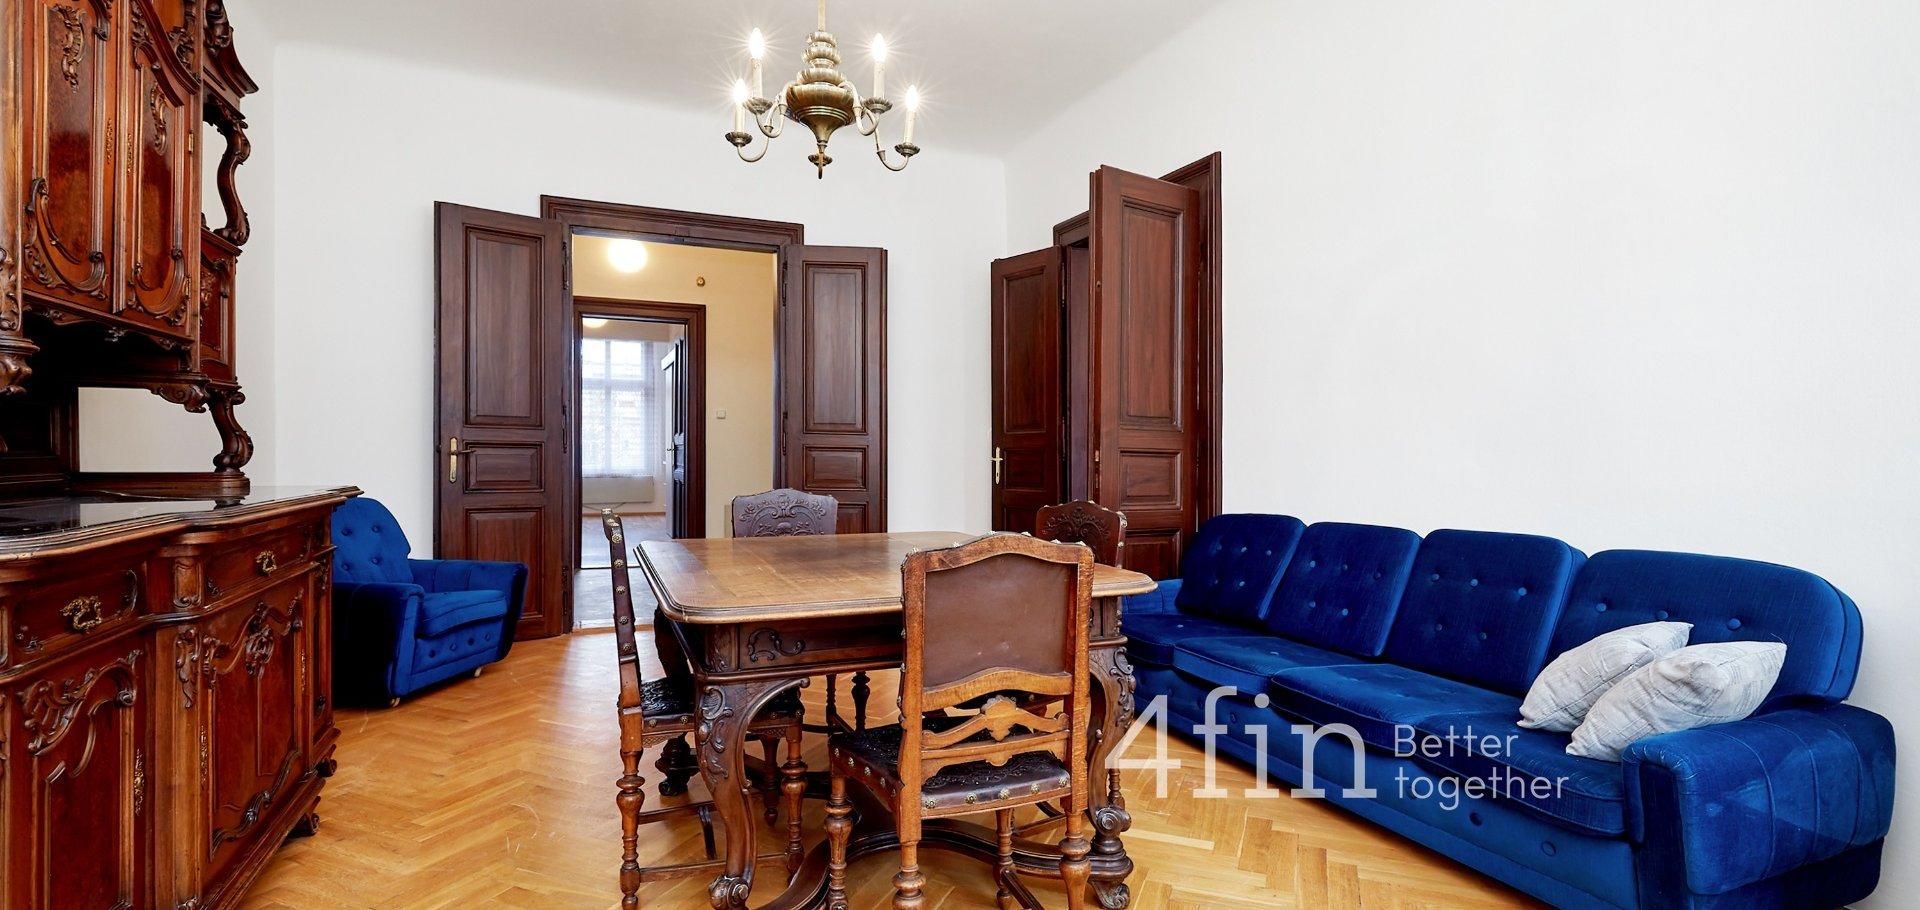 Pronájem bytu 3+kk s nádechem historie, 80m², Praha - Vinohrady